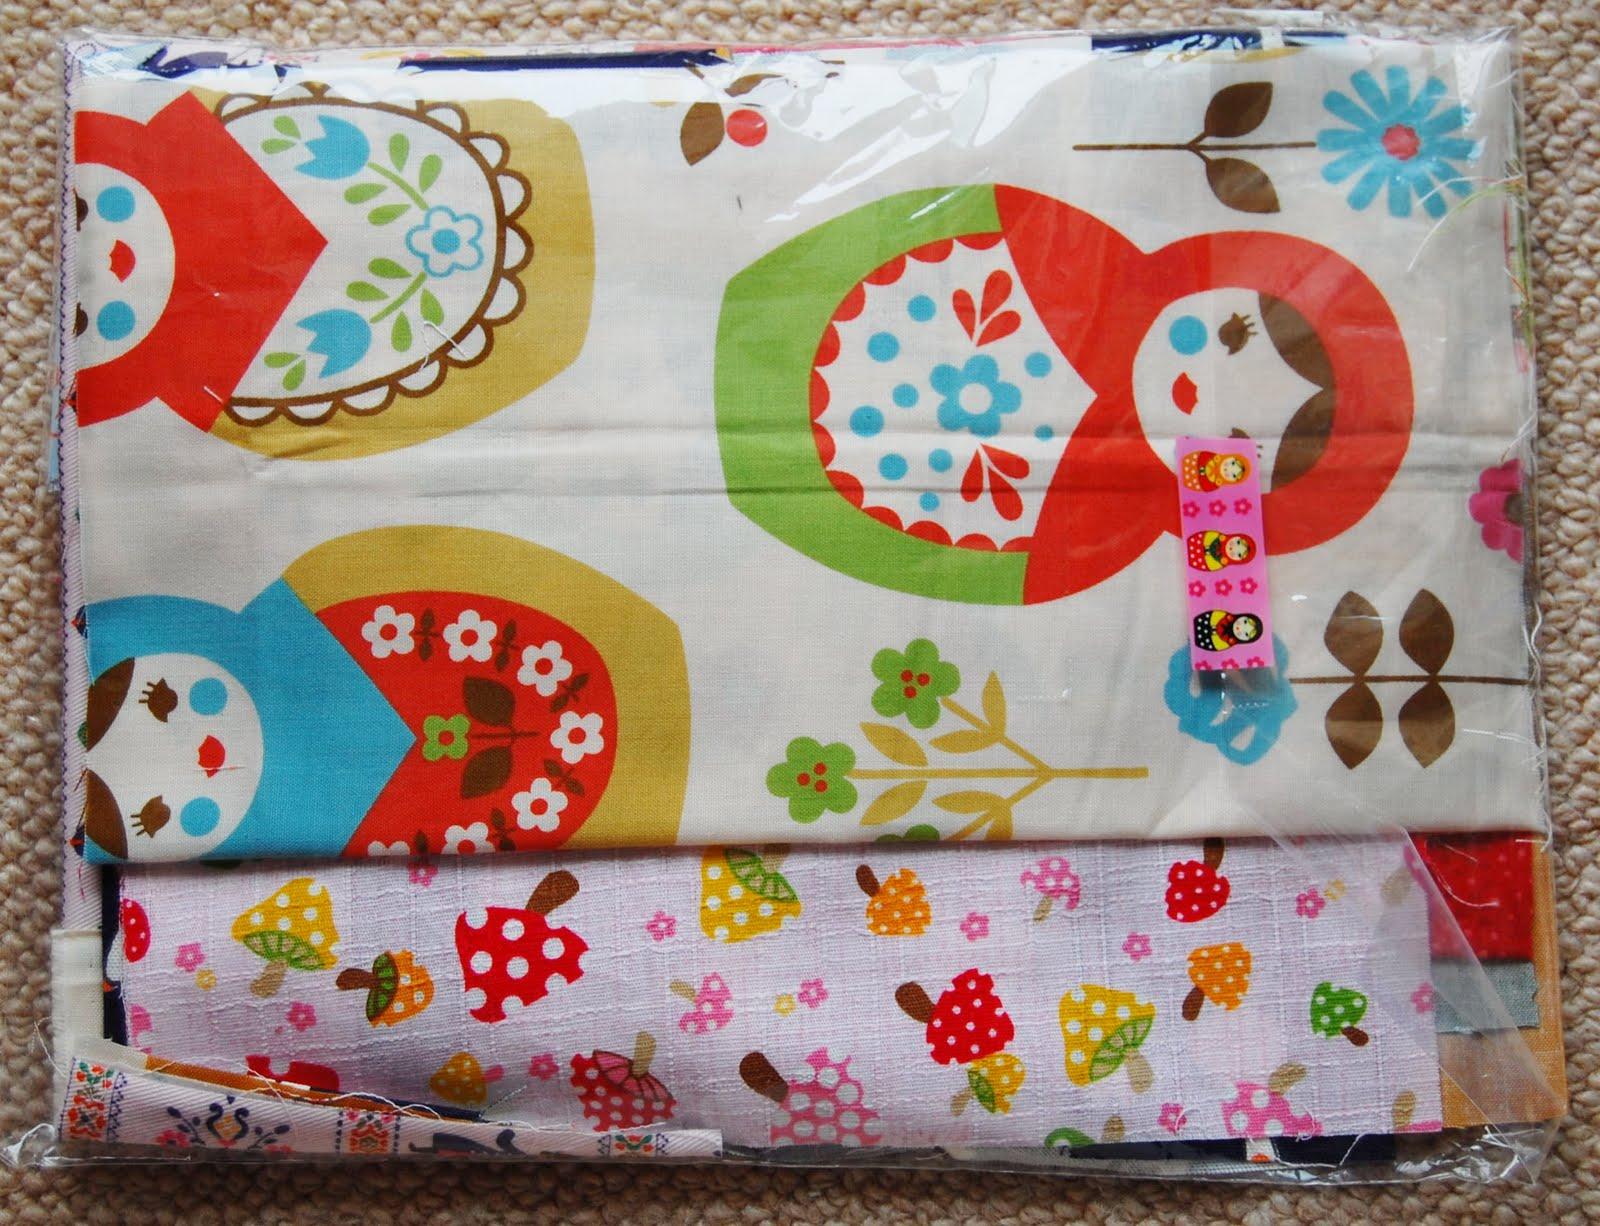 Mybotang fabric scrap series cards - Sb4 Back View